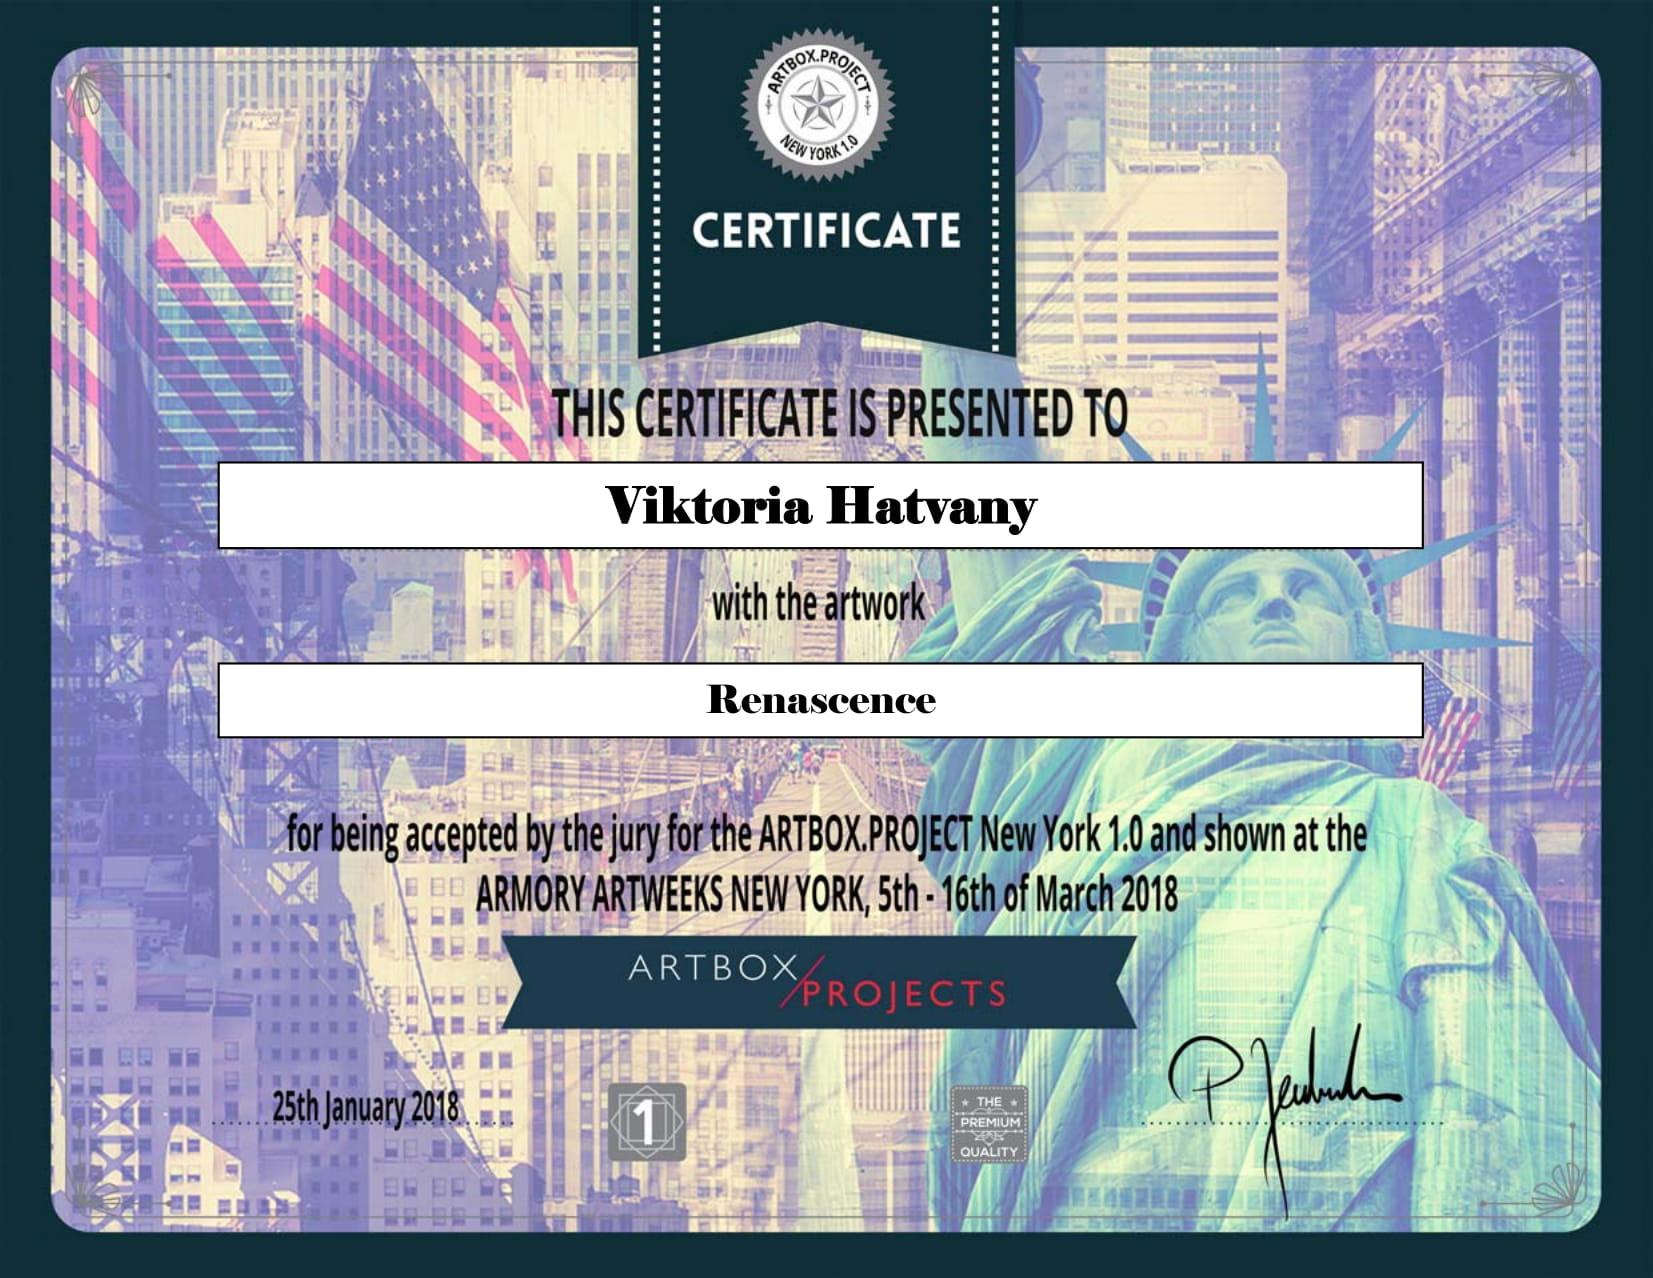 certificatee1 - New York - USA